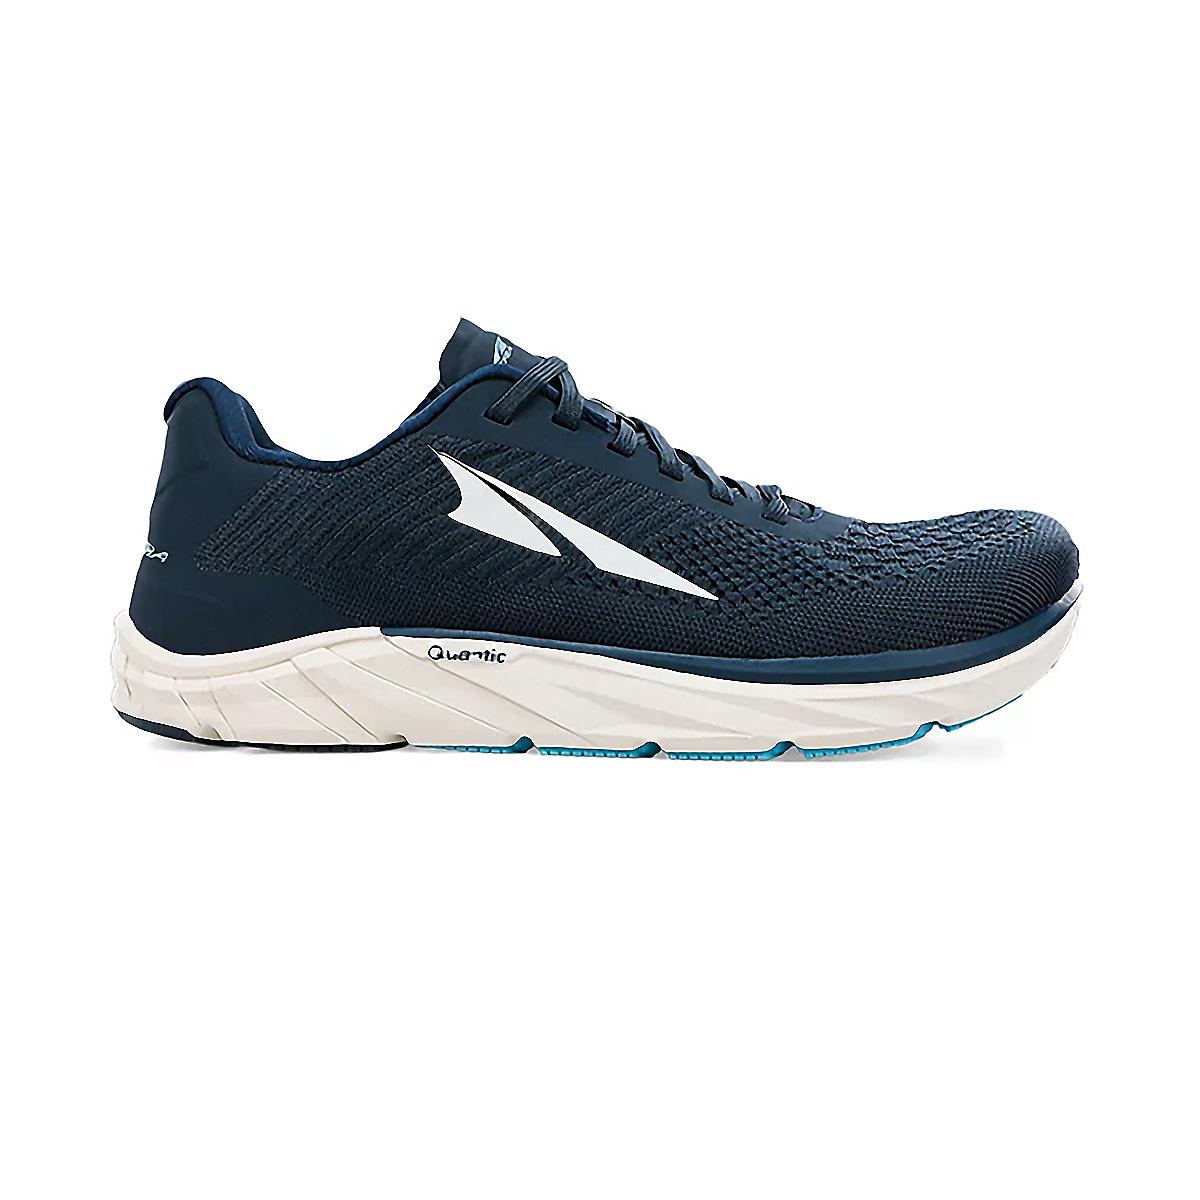 Men's Altra Torin 4.5 Plush Running Shoe - Color: Majolica Blue - Size: 7 - Width: Regular, Majolica Blue, large, image 1